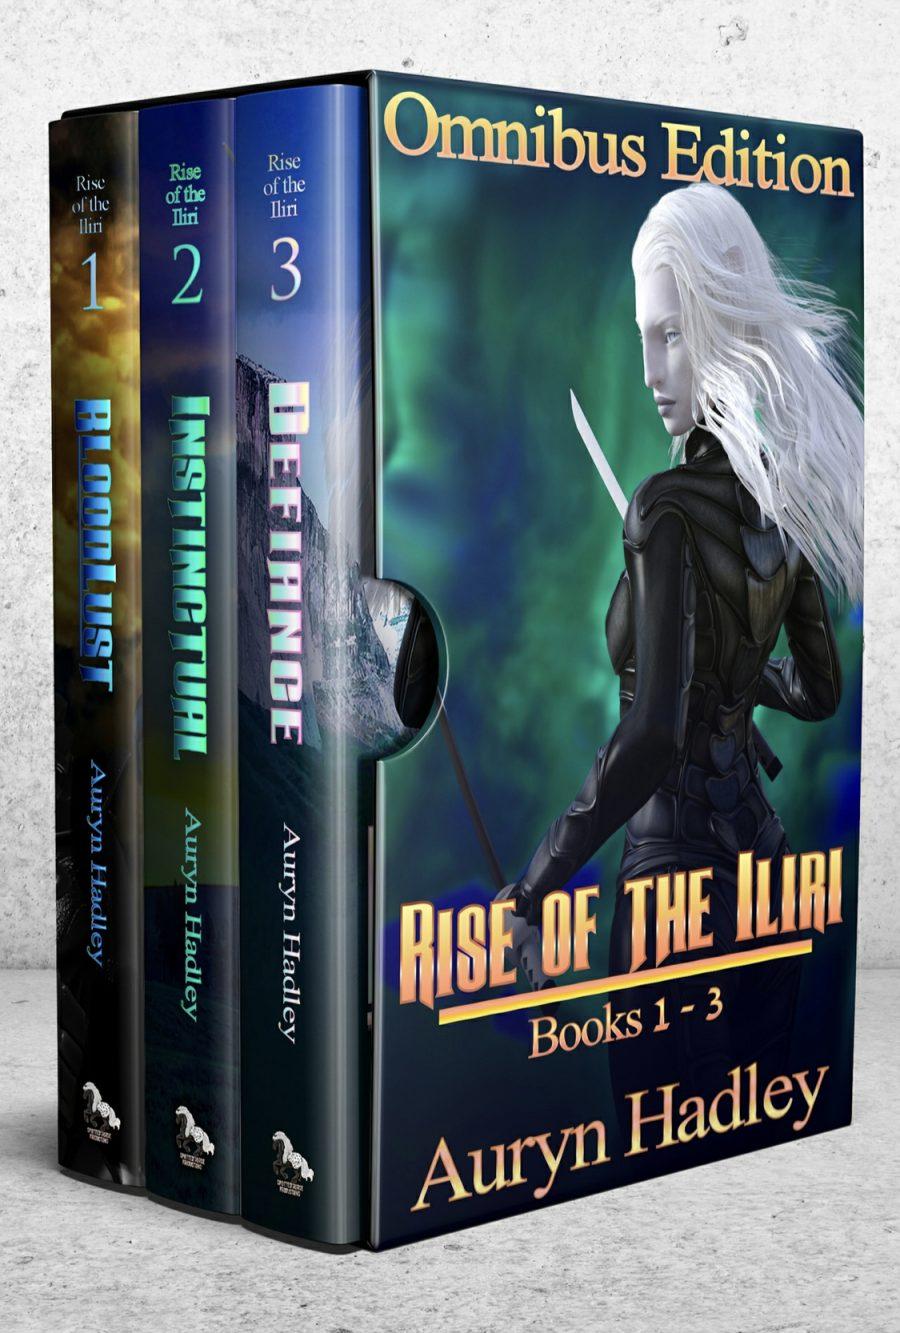 Rise of The Iliri: Book 1-3 (Box Set) by Auryn Hadley - A Book Review #EpicFantasy #SlowBurn #RH #SciFi #5Stars #BoxSet #KindleUnlimited #KU #Omnibus